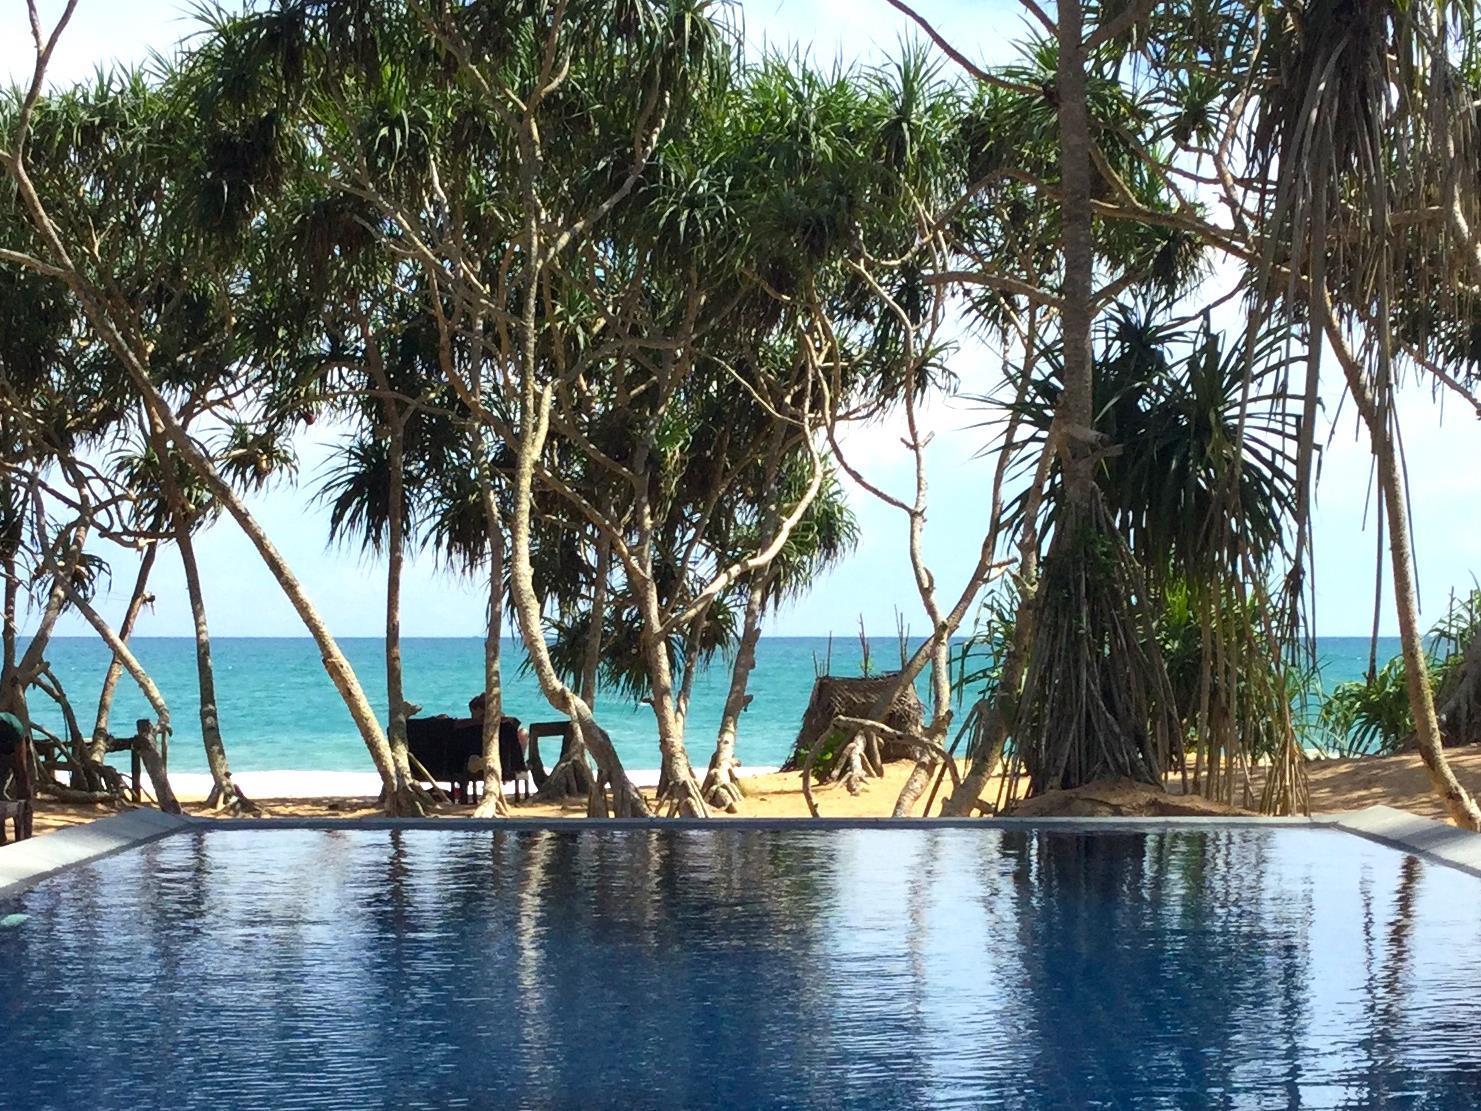 Sanjis The Seaside Cabanas Hotel, Tangalle